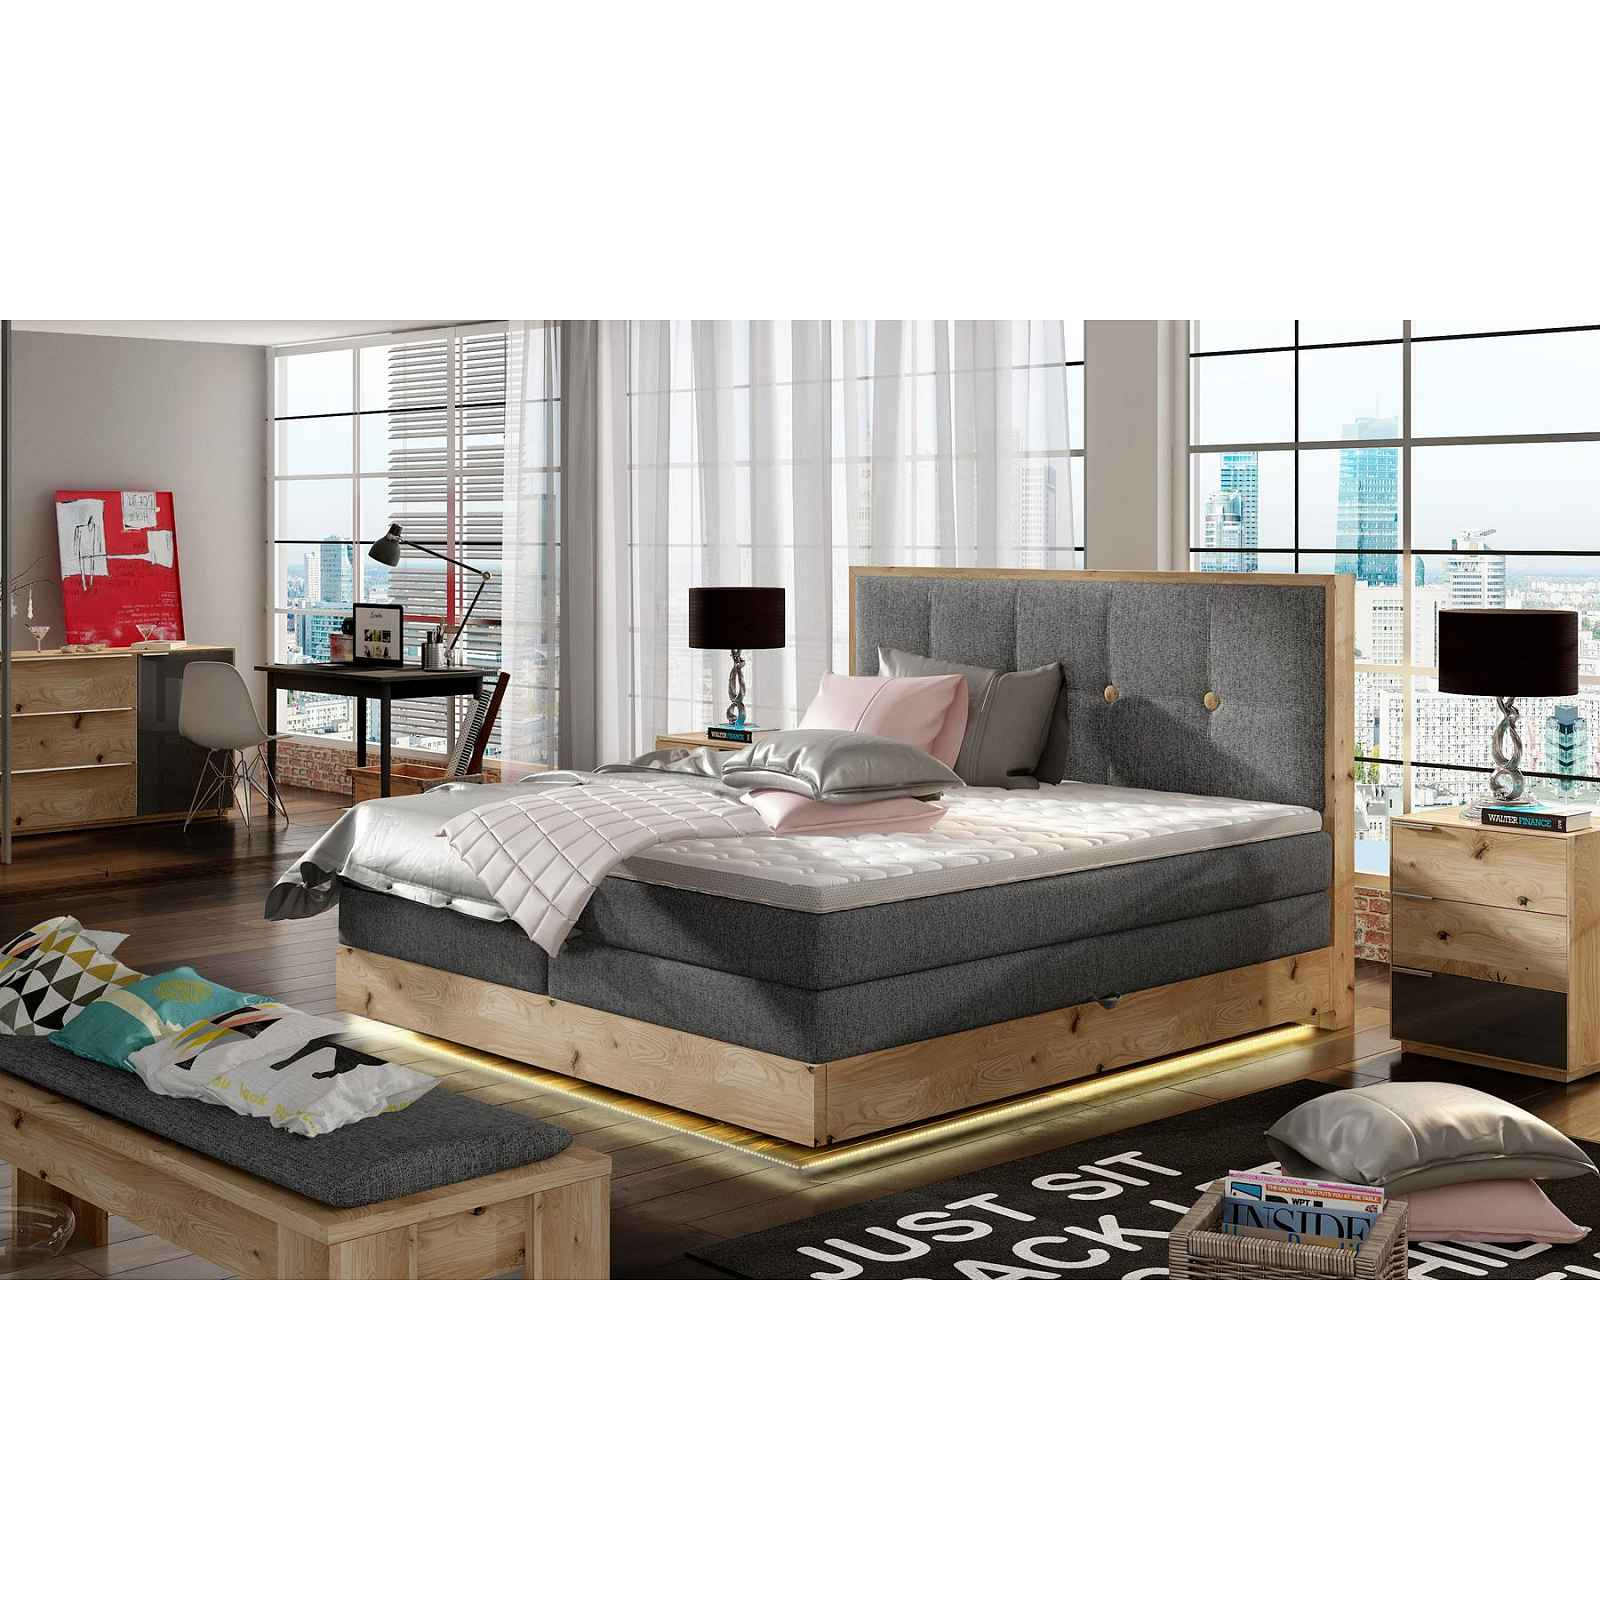 Luxusní box spring postel Esko 180x200 + LED HELCEL